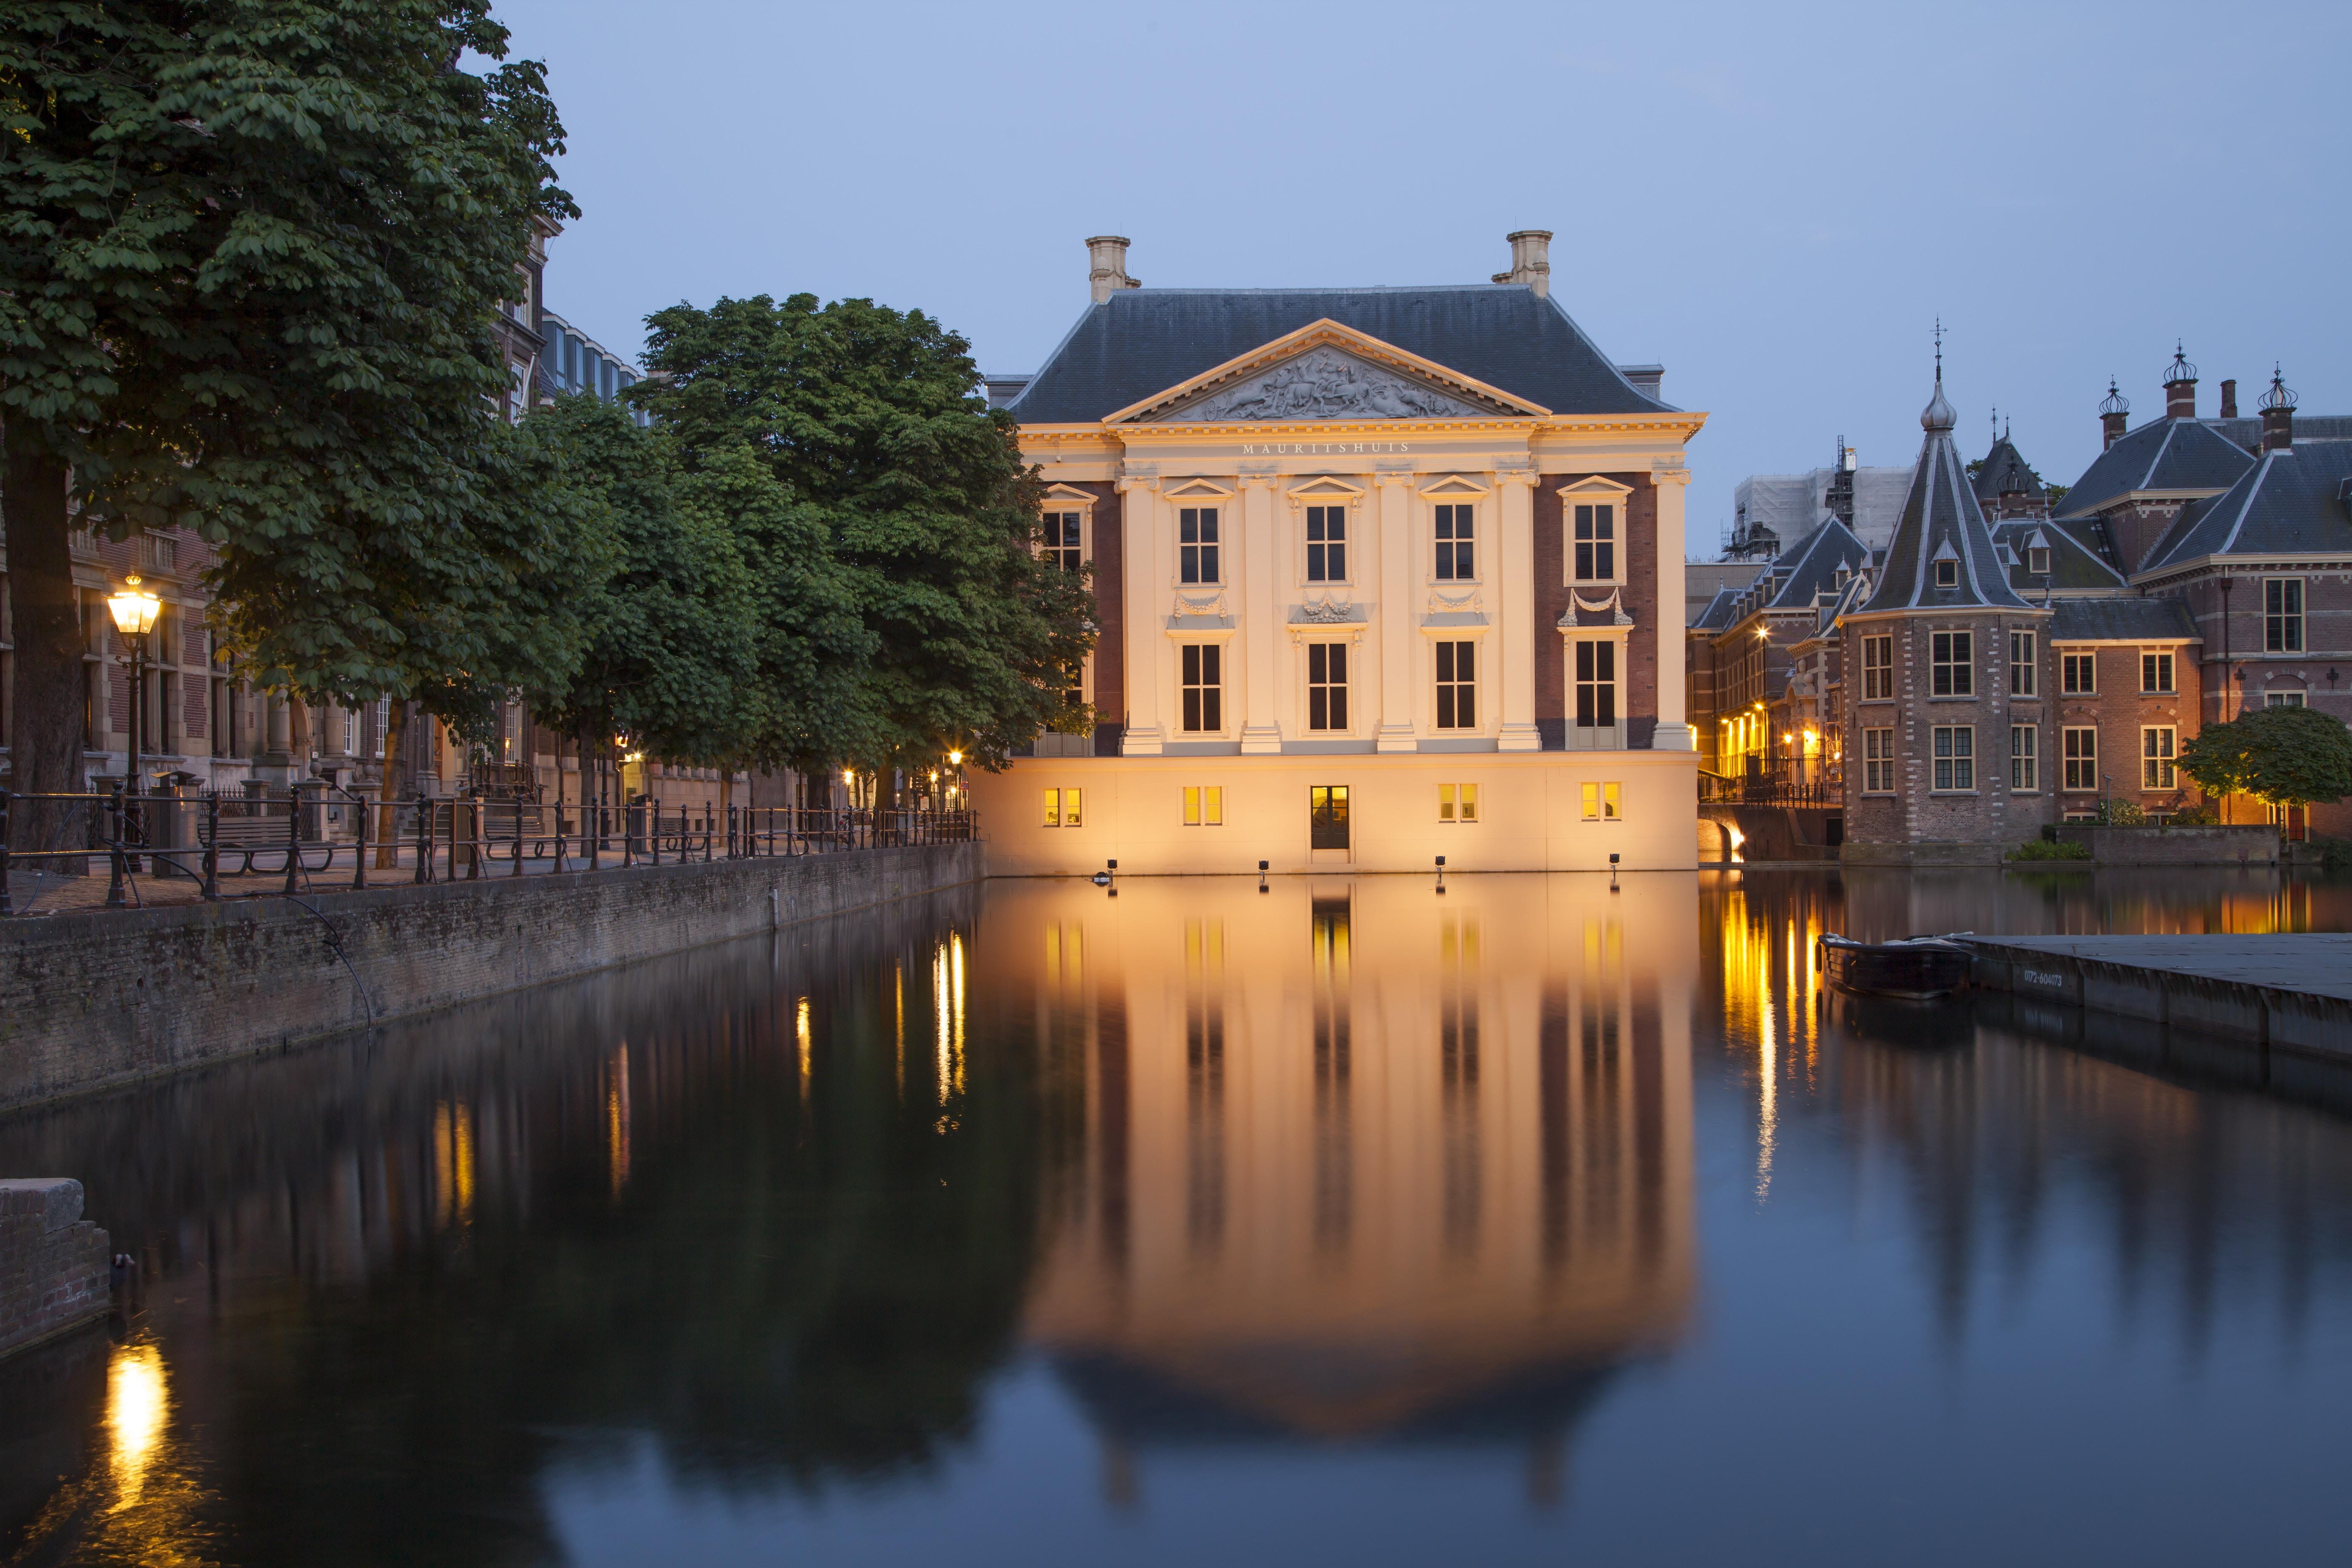 Mauritshuis Museum near Binnenhof Palace in Hague, Netherlands. ©Sergey Dzyuba/Shutterstock